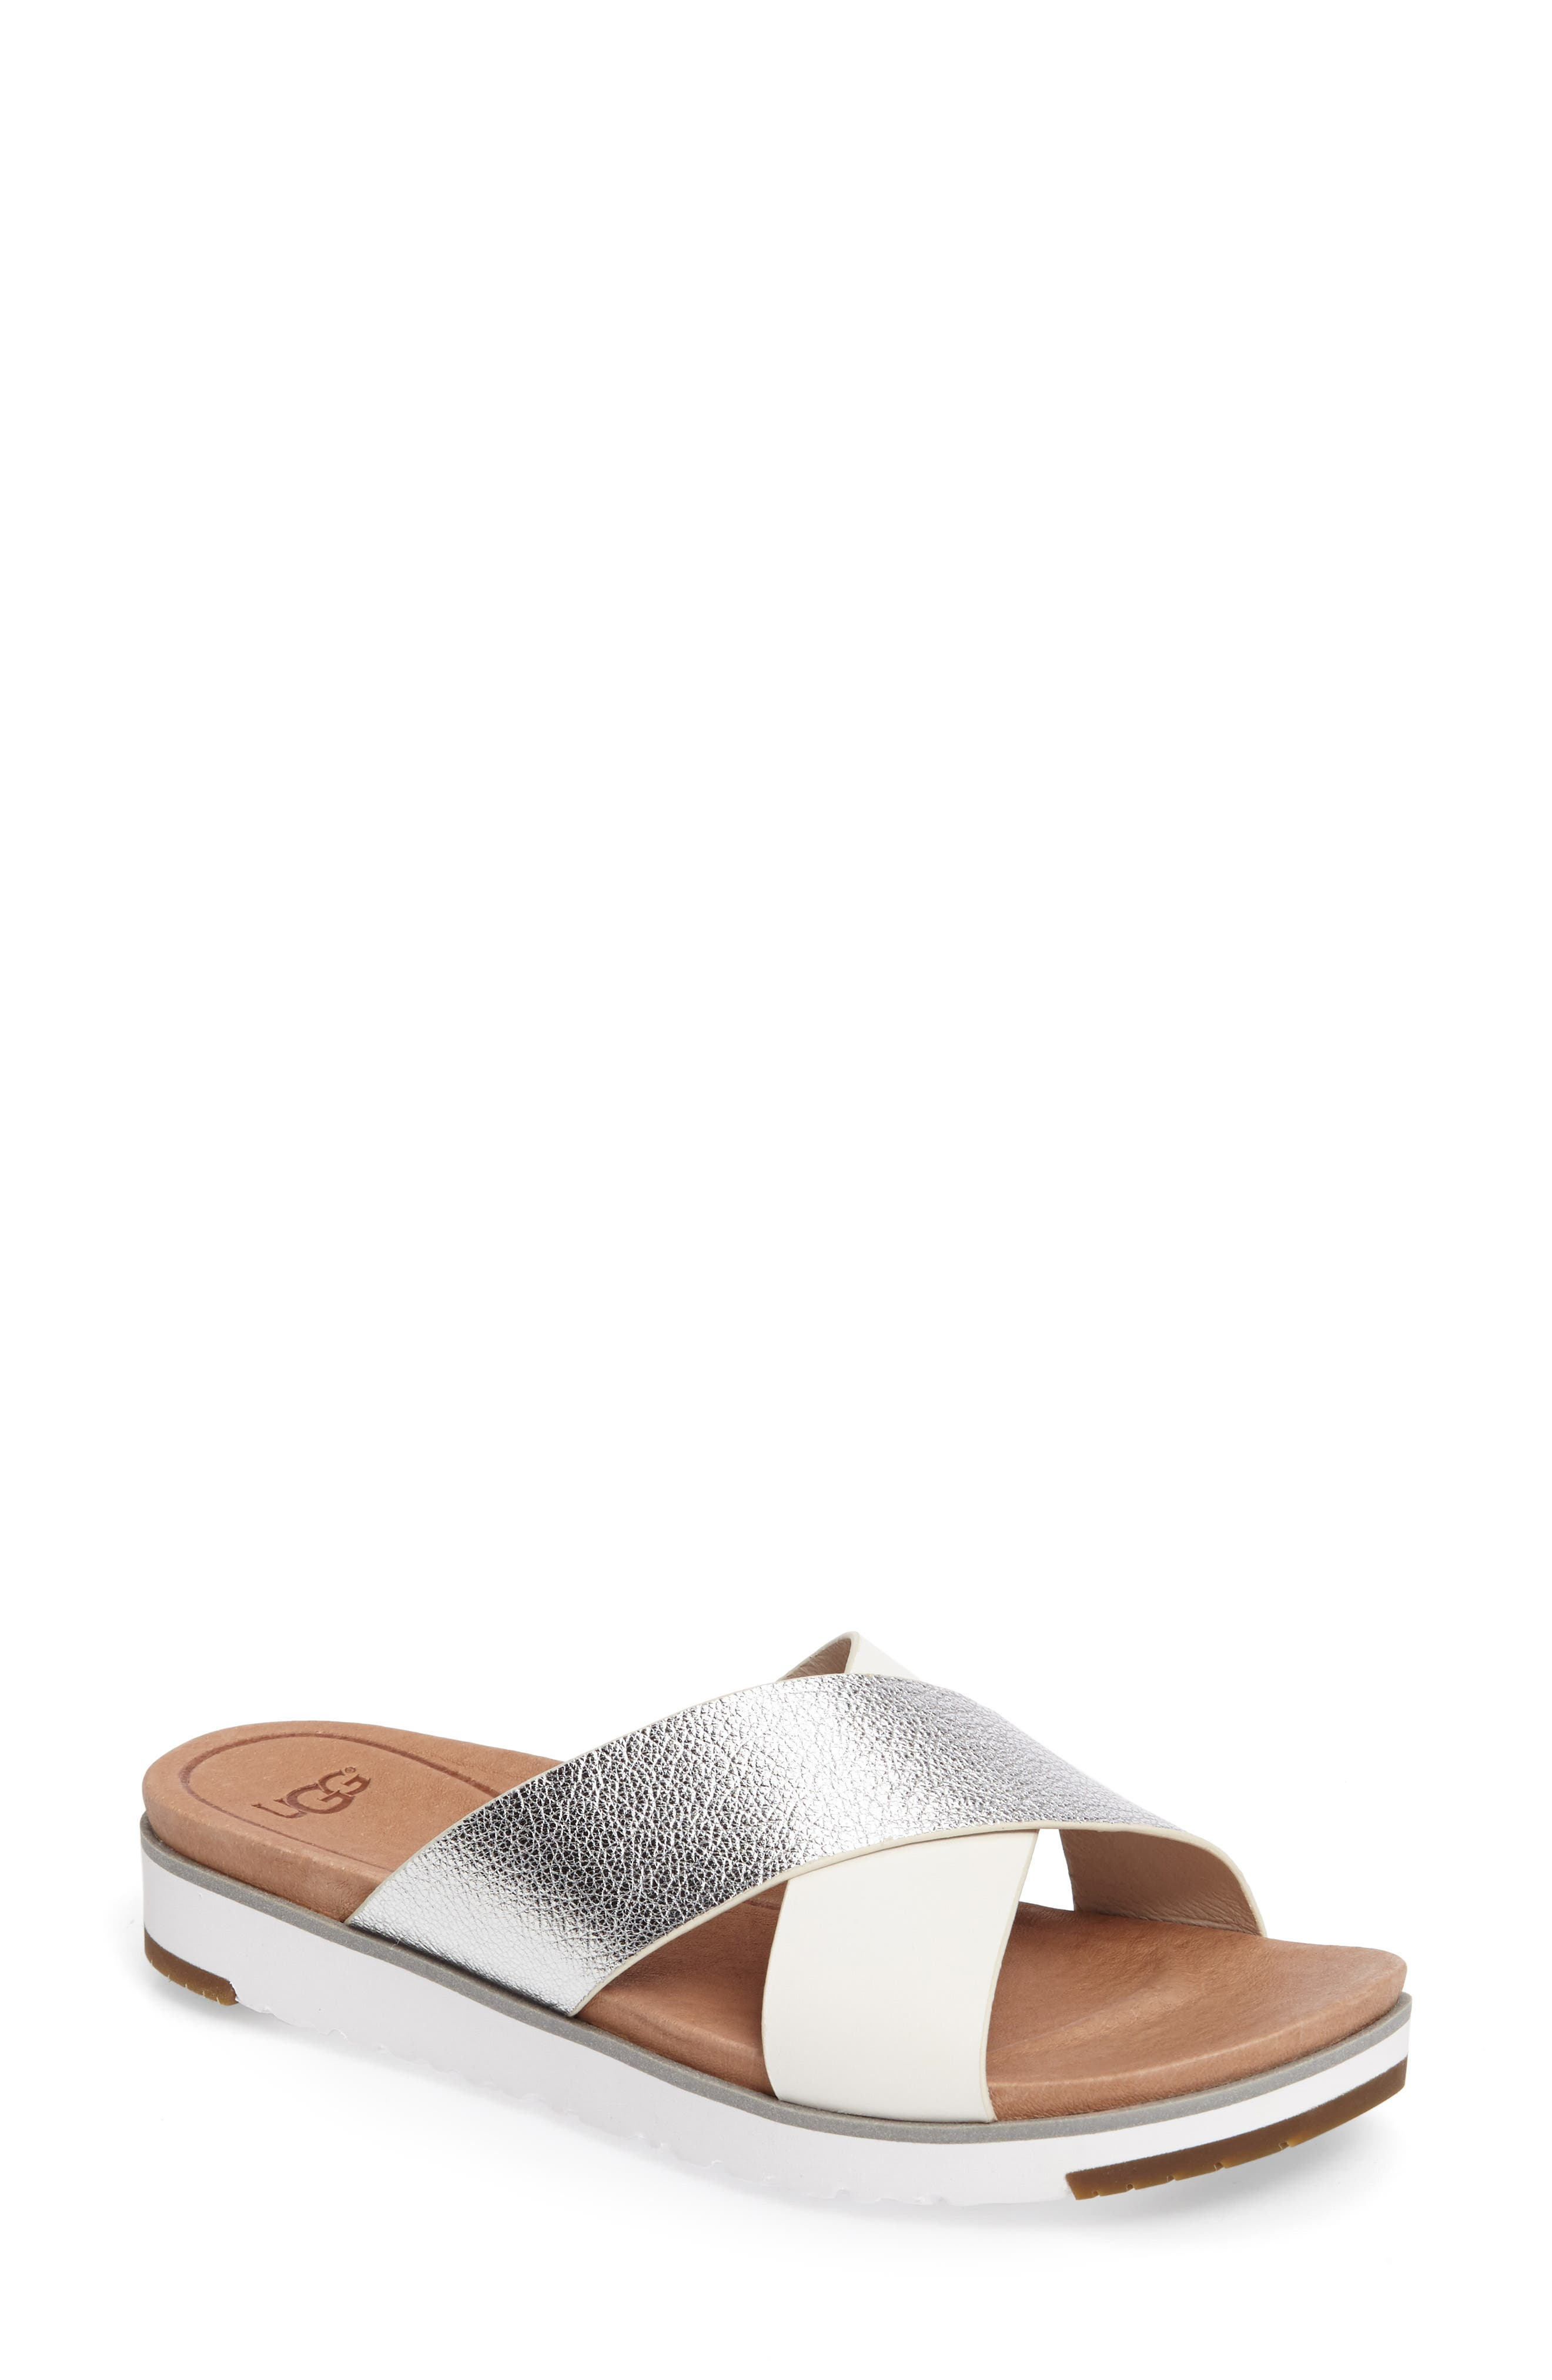 Alternate Image 1 Selected - UGG® 'Kari' Sandal (Women)